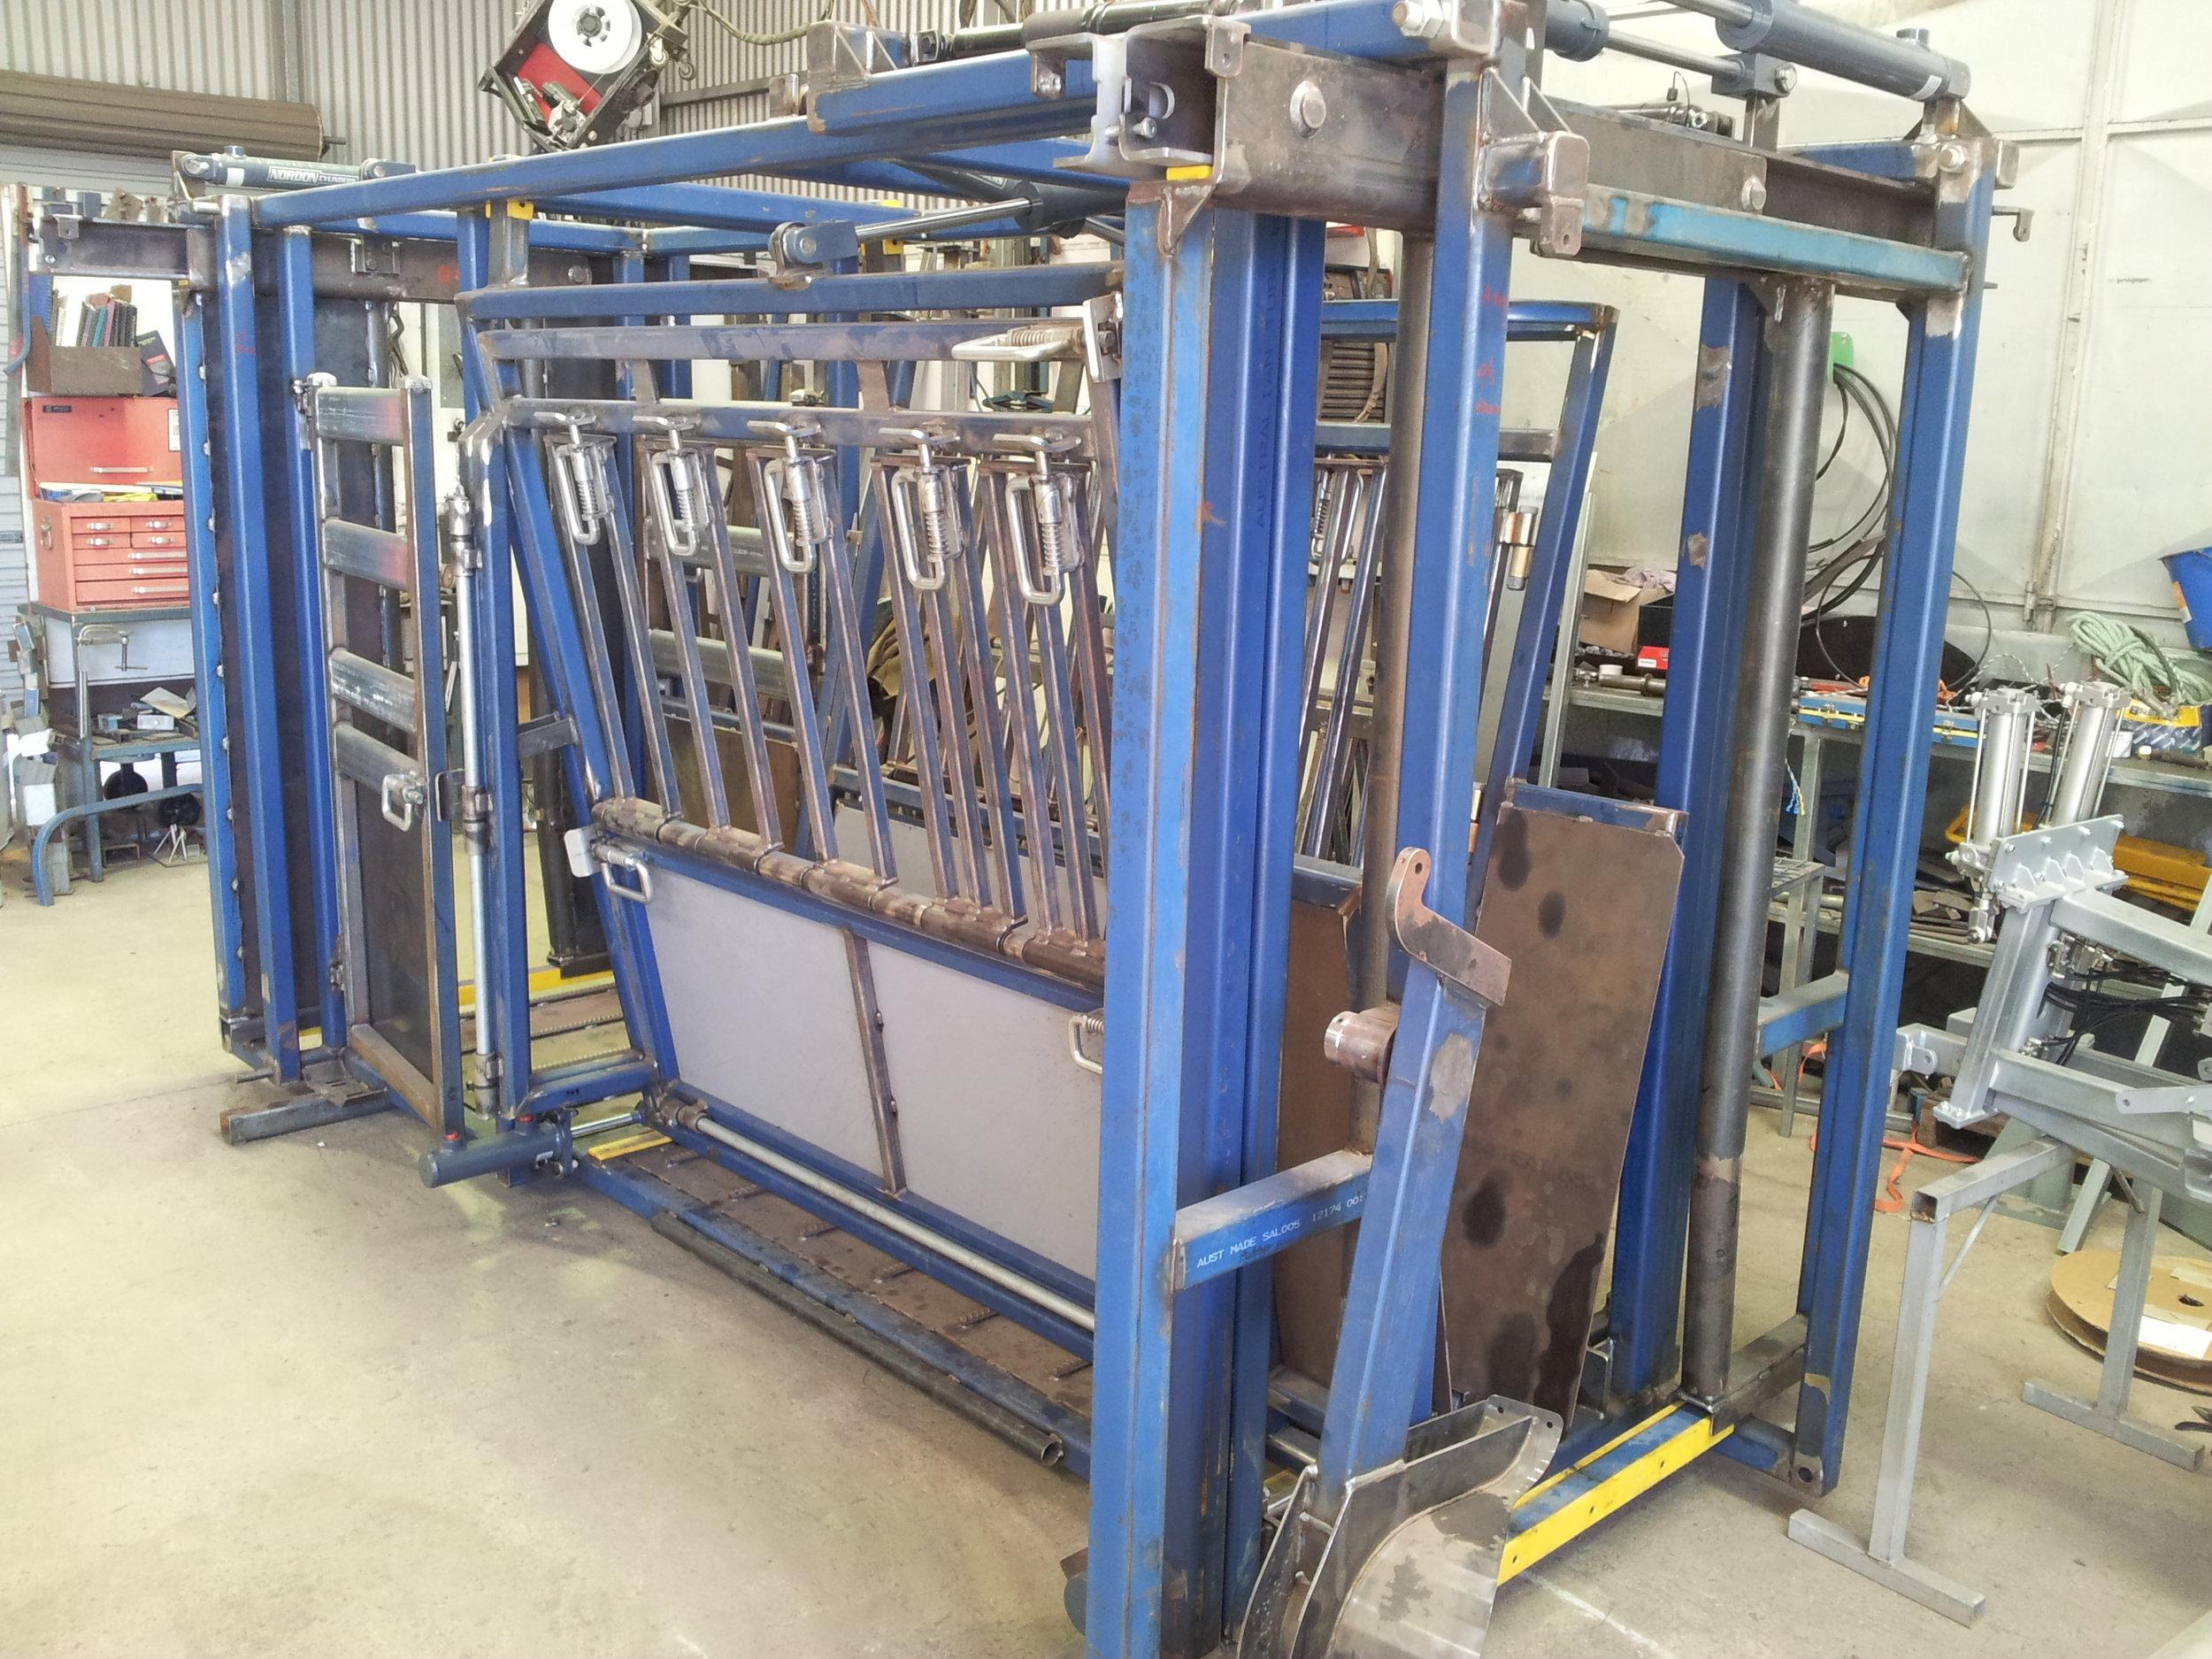 Prototype in Thompson Longhorn factory